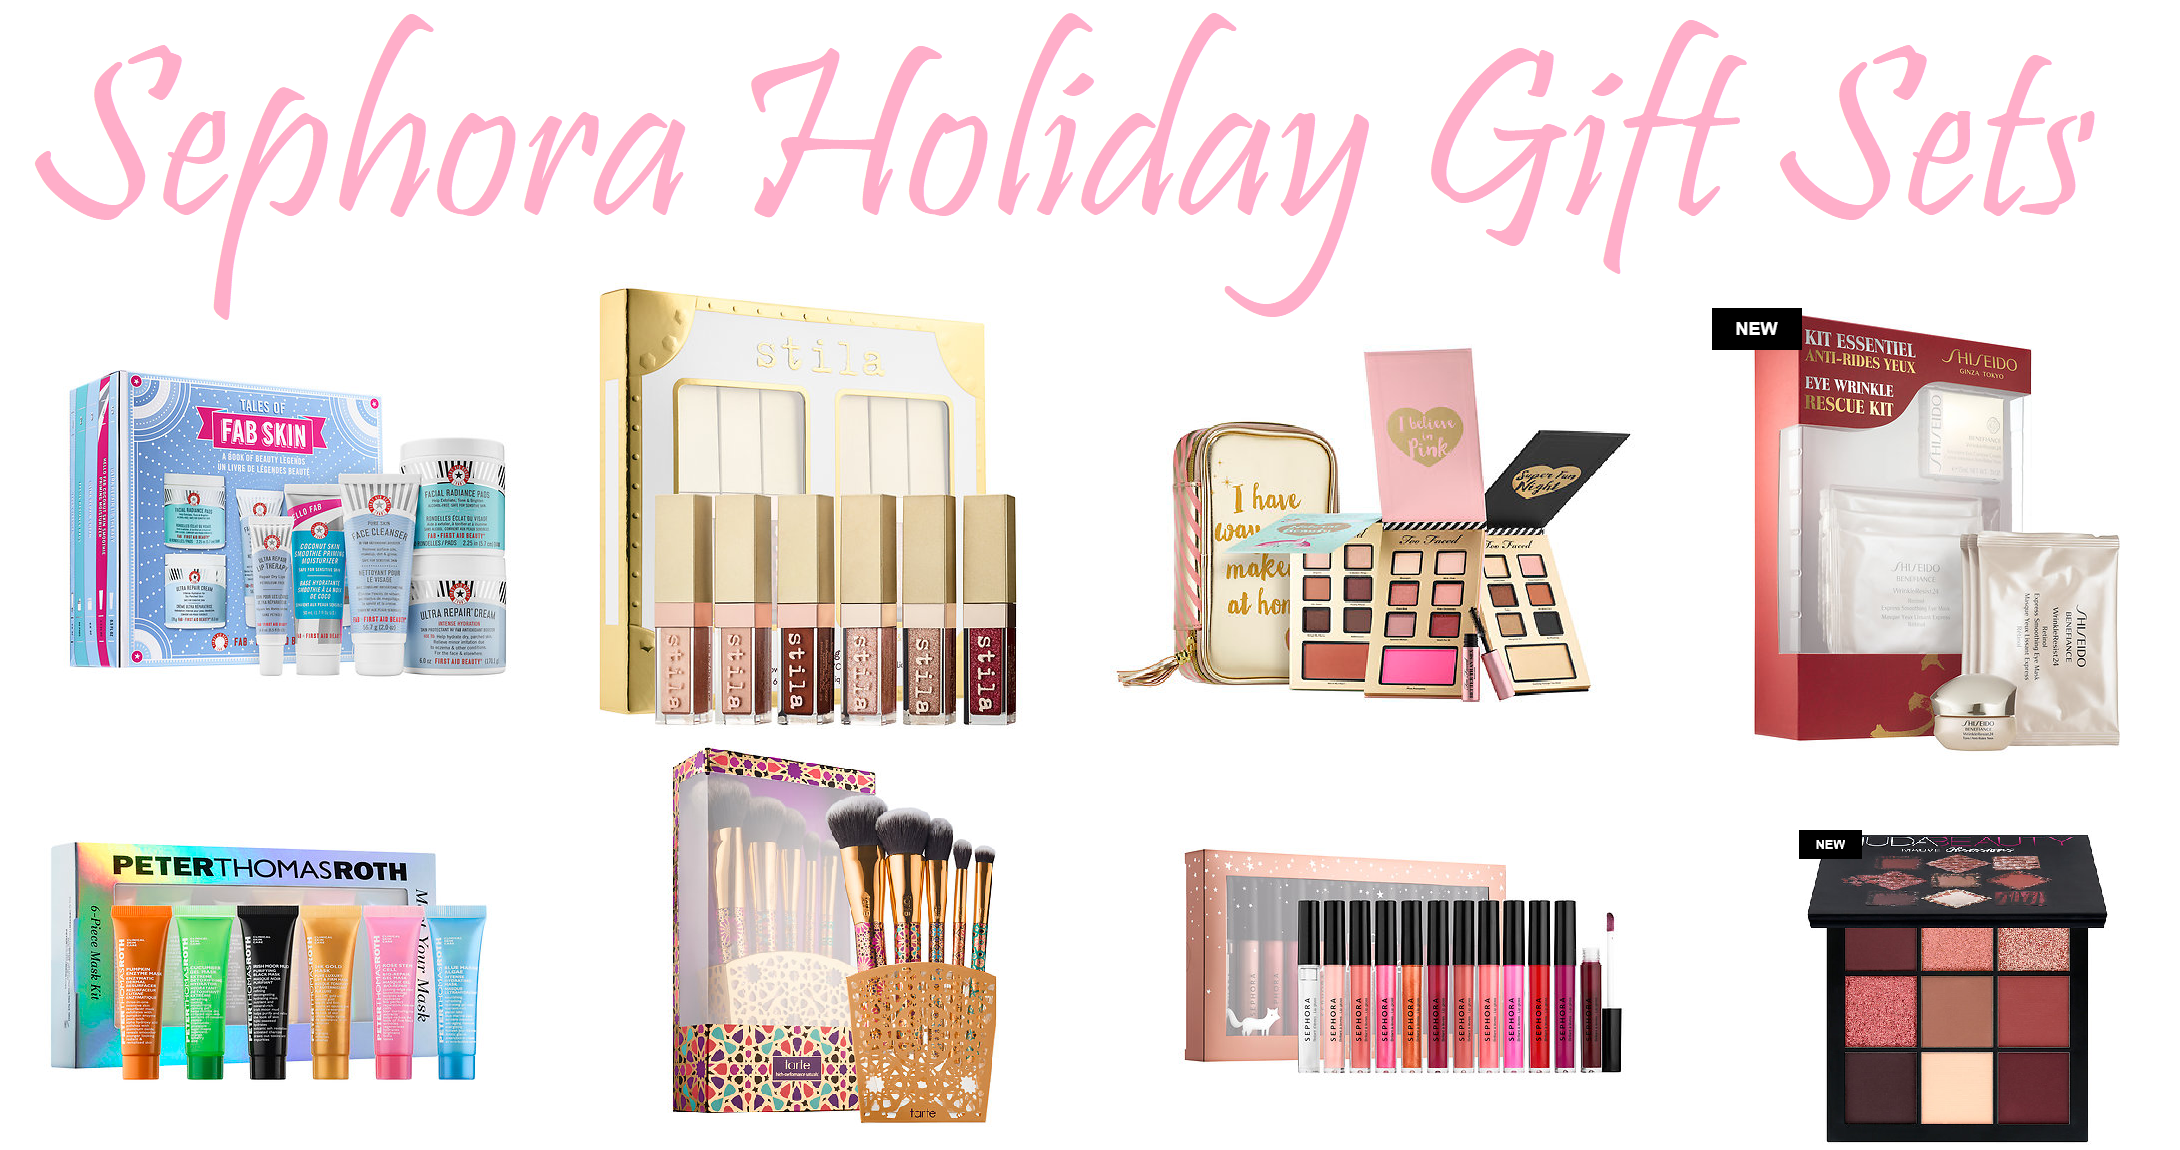 Sephora gift set picture